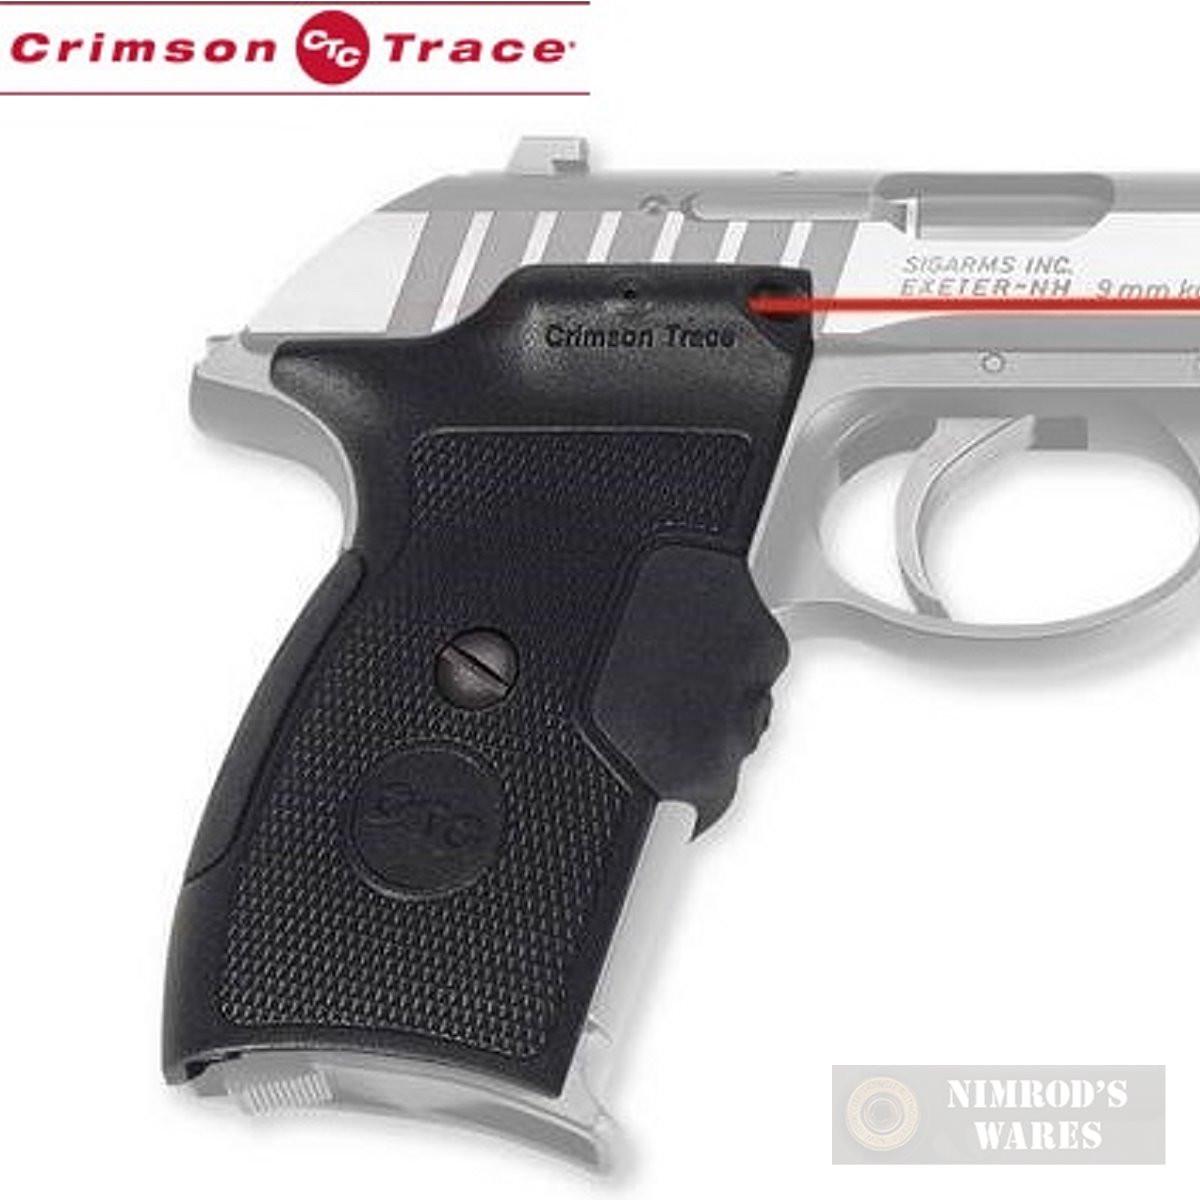 Crimson Trace SIG SAUER P230 P232 LASER GRIP Sight LG-432